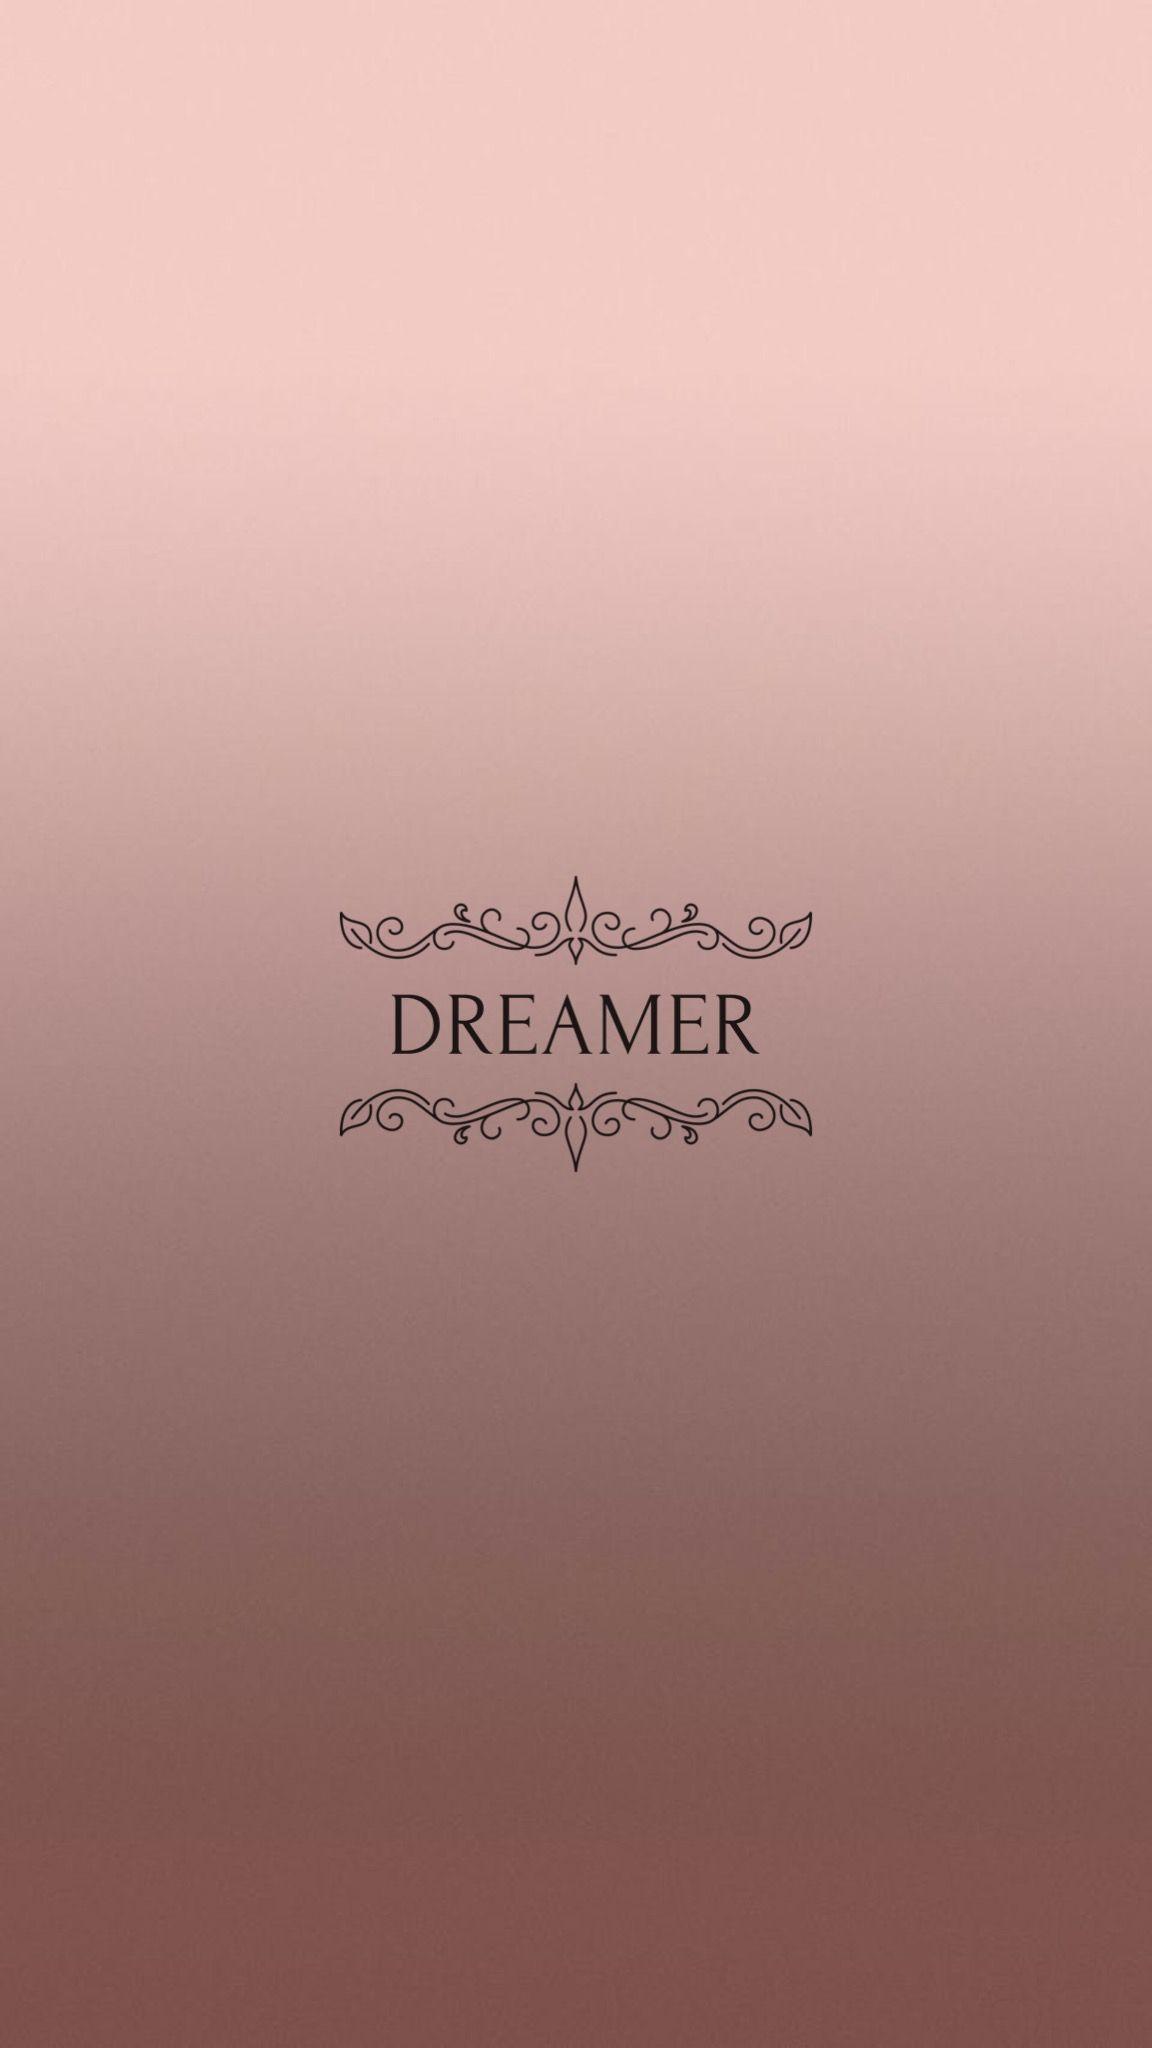 dreamerpretty positivity��� rosegold dreamer wallpaper